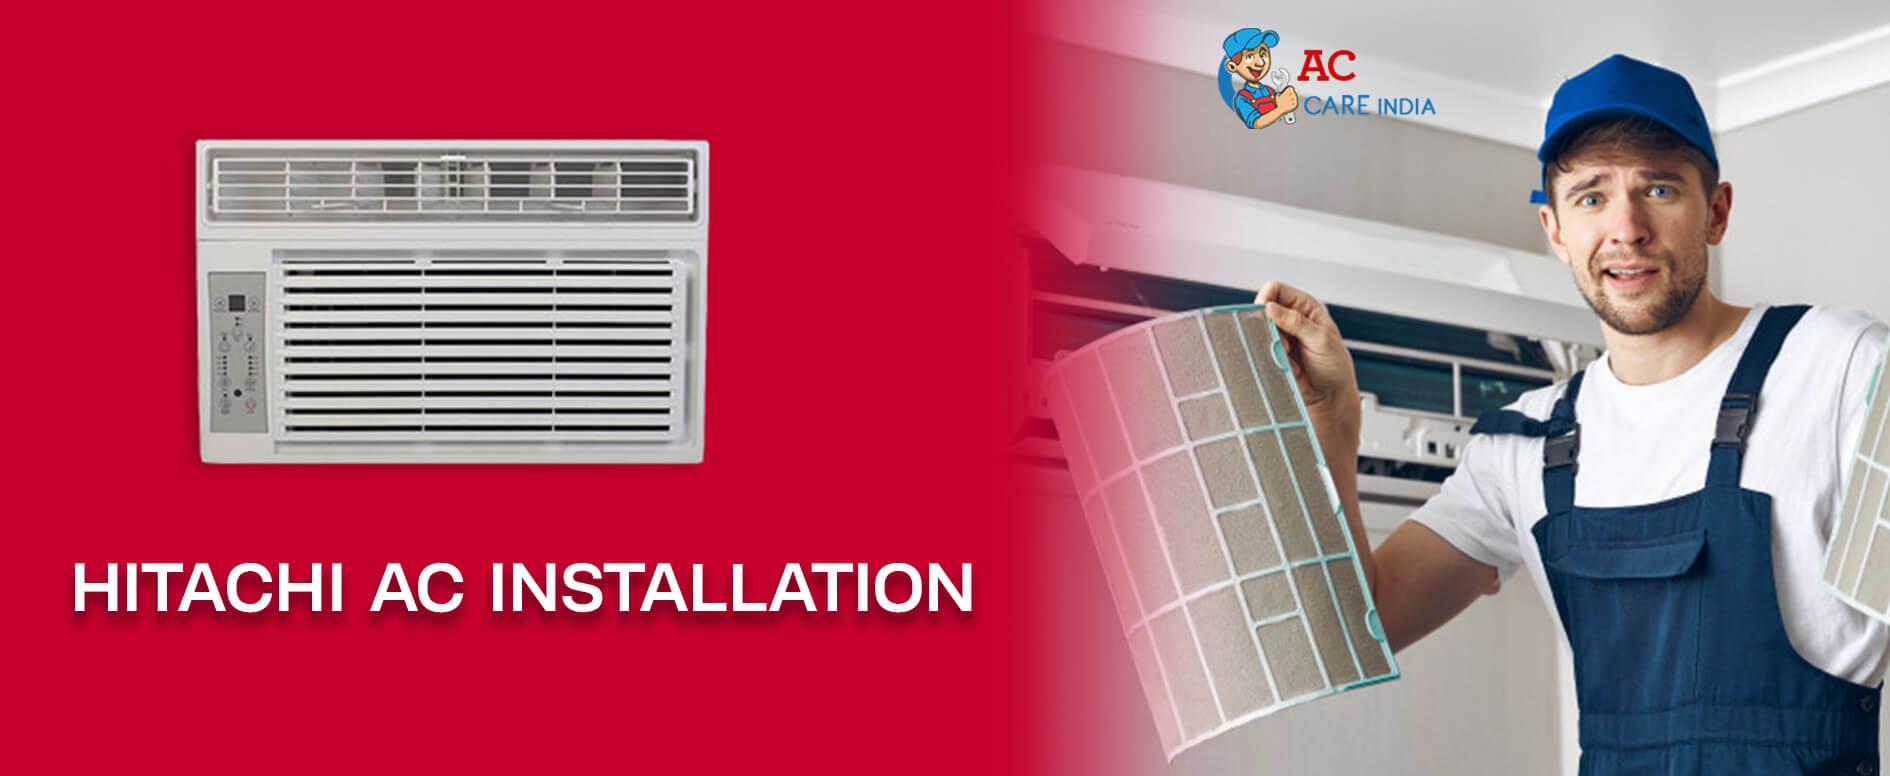 Hitachi AC Installation 9266608882